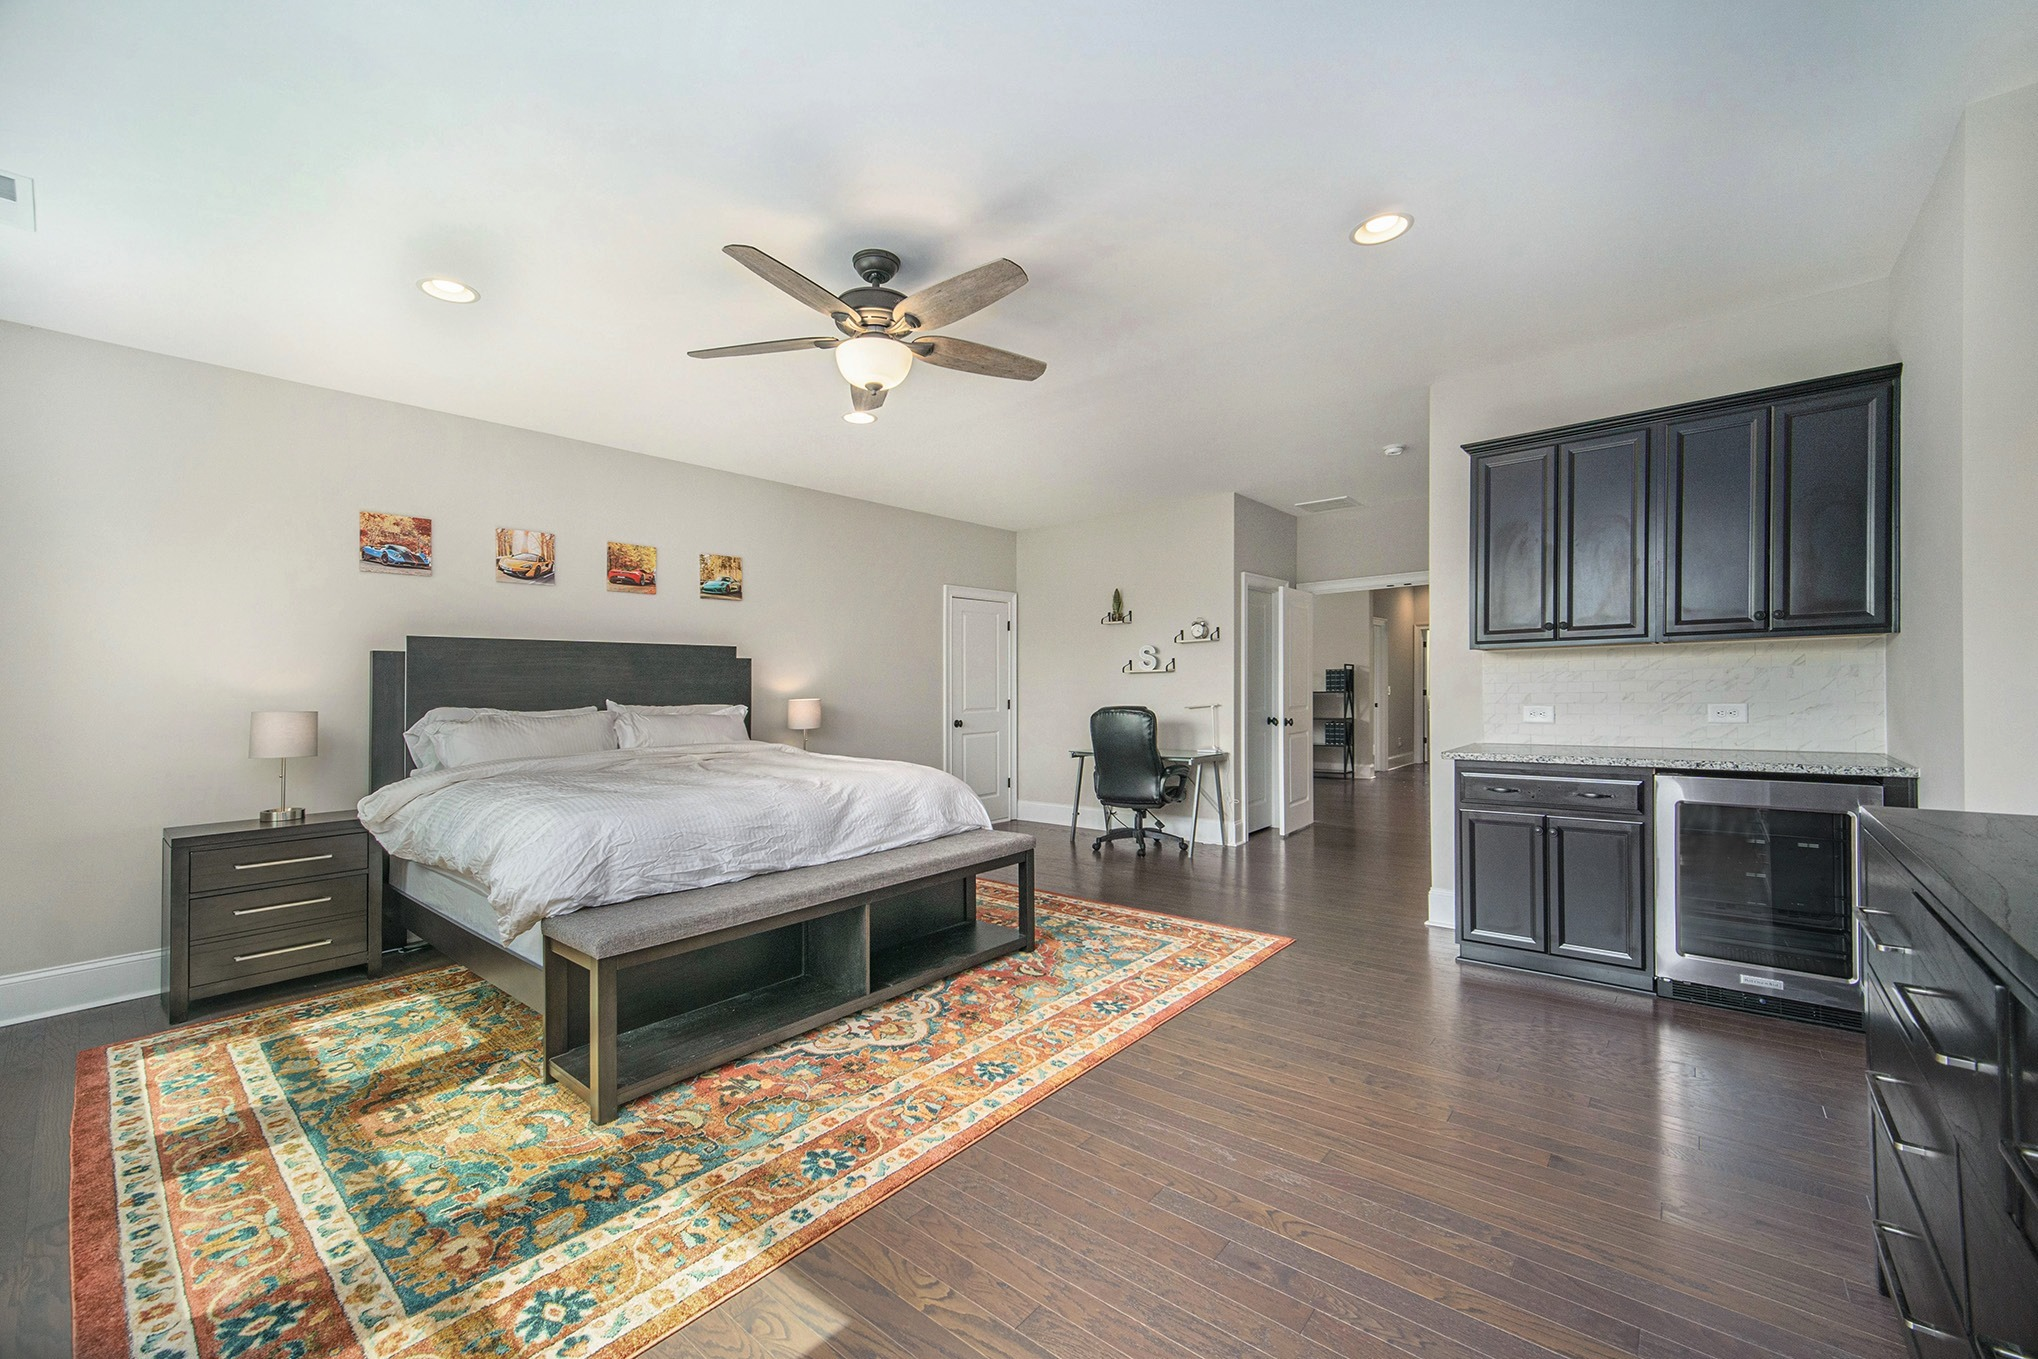 Recreation room set up as bedroom